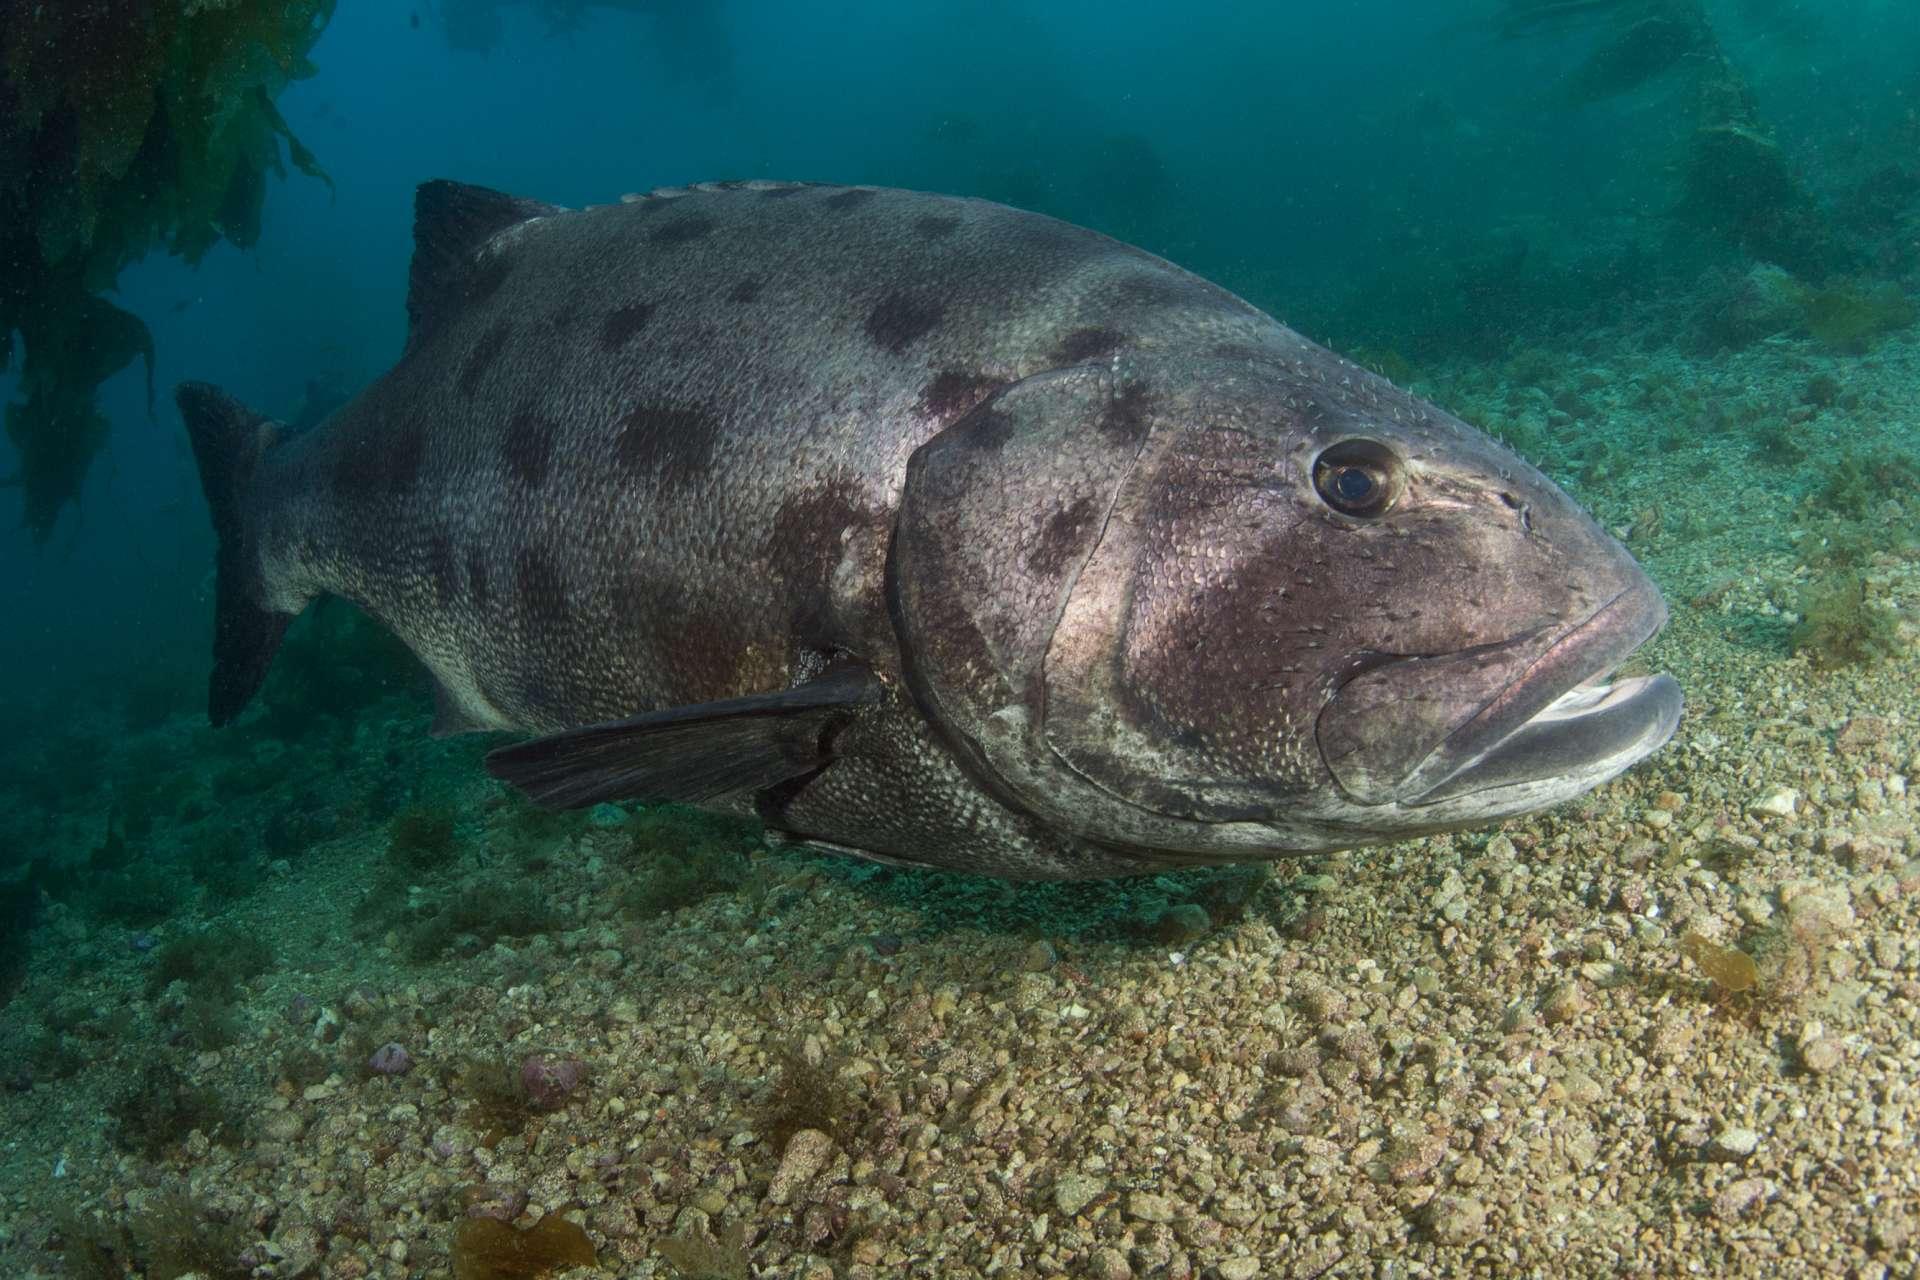 Black sea bass_1286